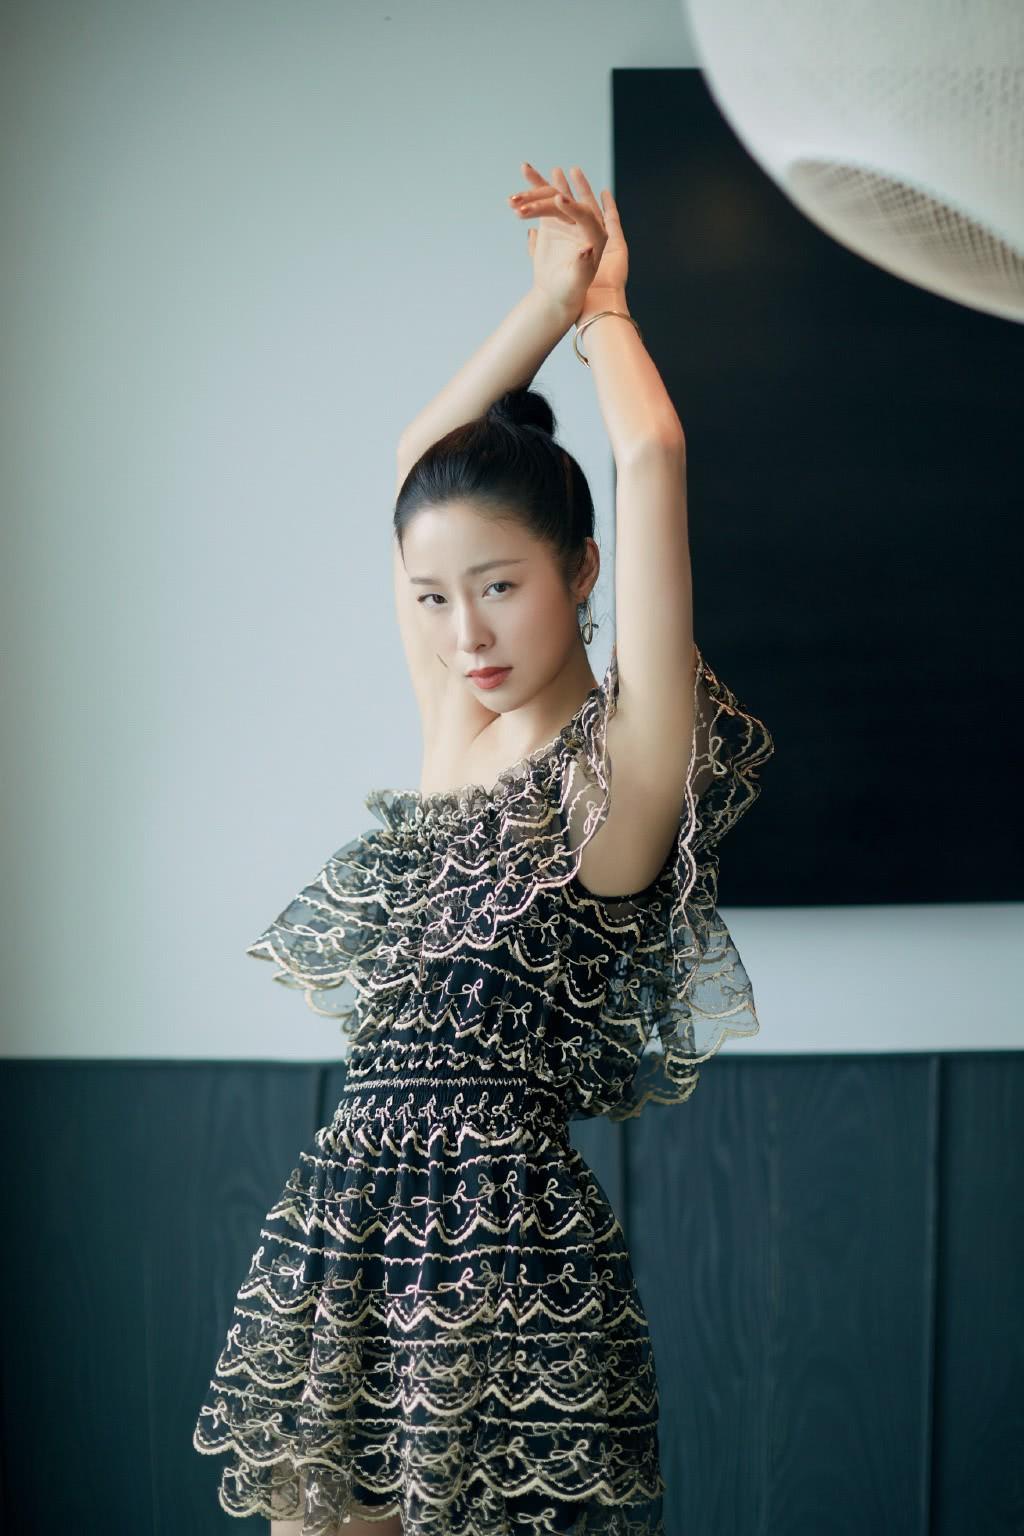 <b>《插翅难逃》她演唱片尾曲,今36岁穿斜肩超短裙,优雅得像公主</b>